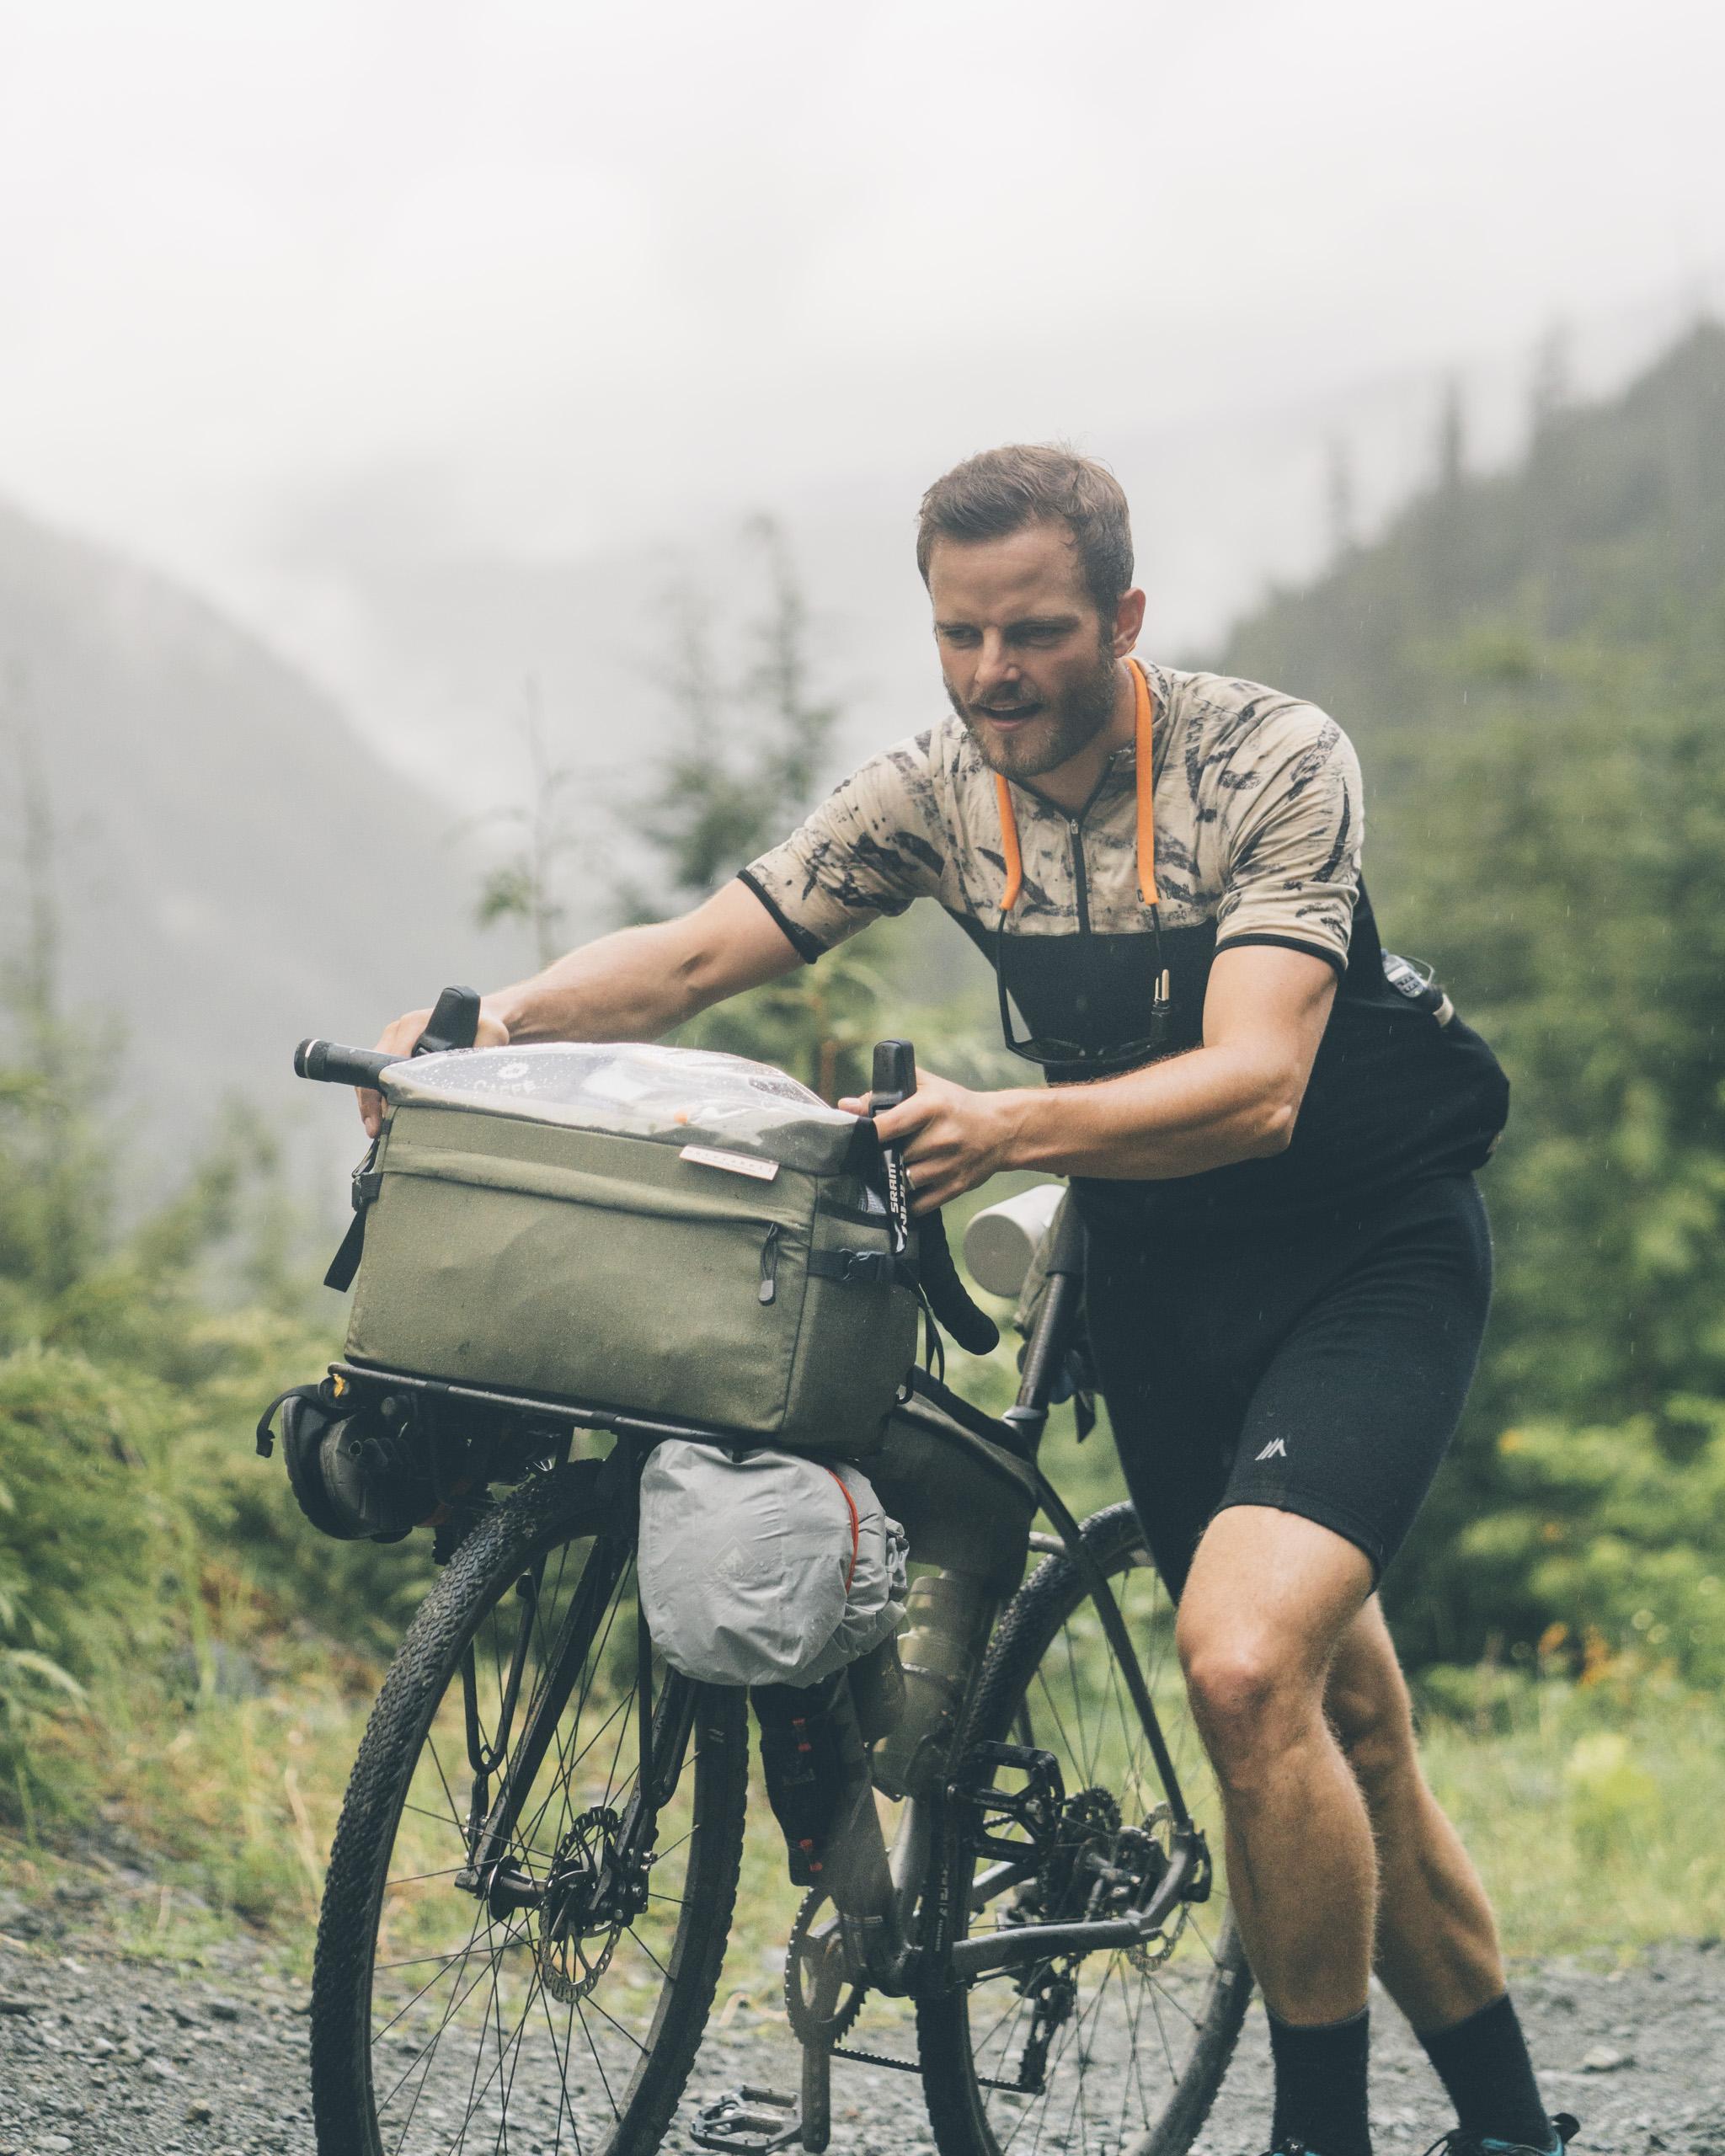 Bikepacking-VanIsland-JohnsonStudios-201806-71.jpg